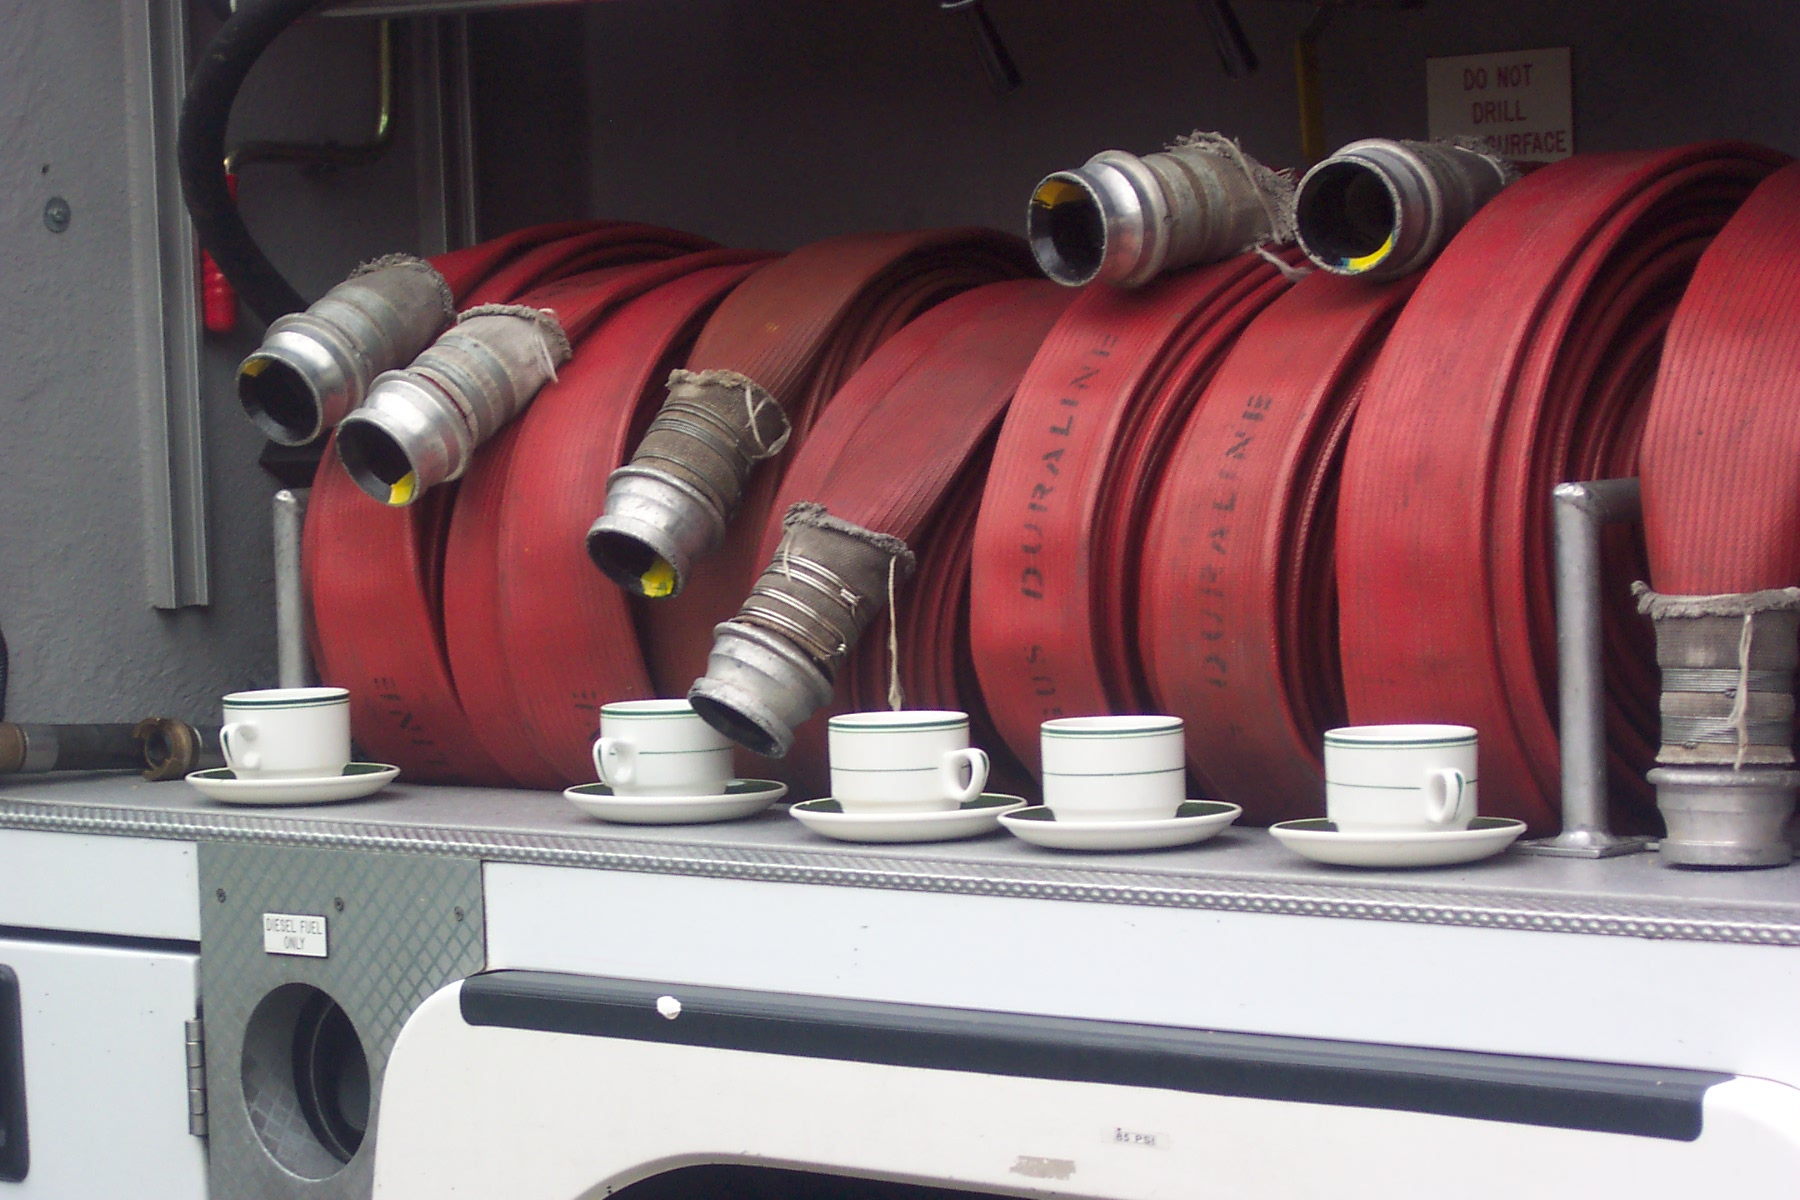 Firefighters' tea time